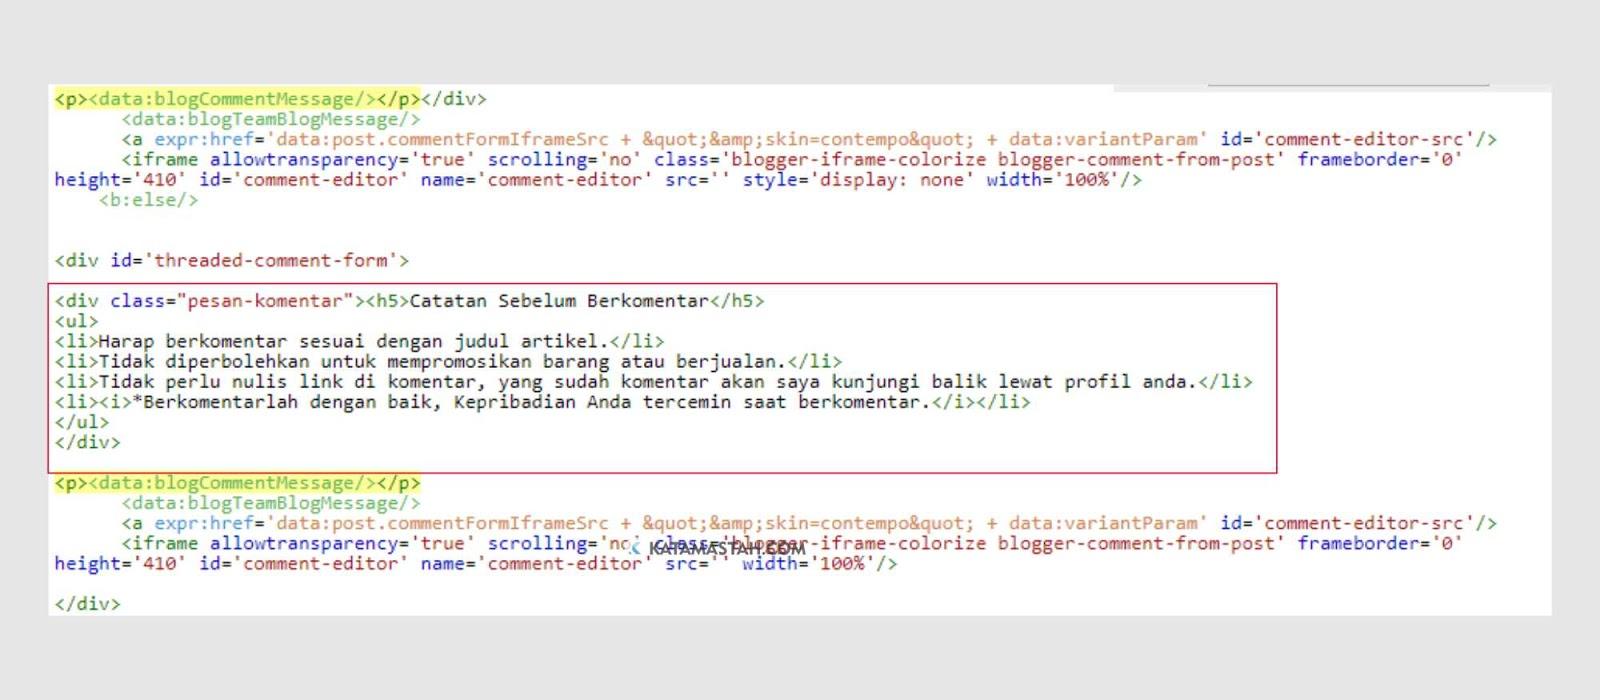 Cara Modifikasi Tampilan Pesan Komentar Pada Blog Cara Modifikasi Tampilan Pesan Komentar Pada Blog